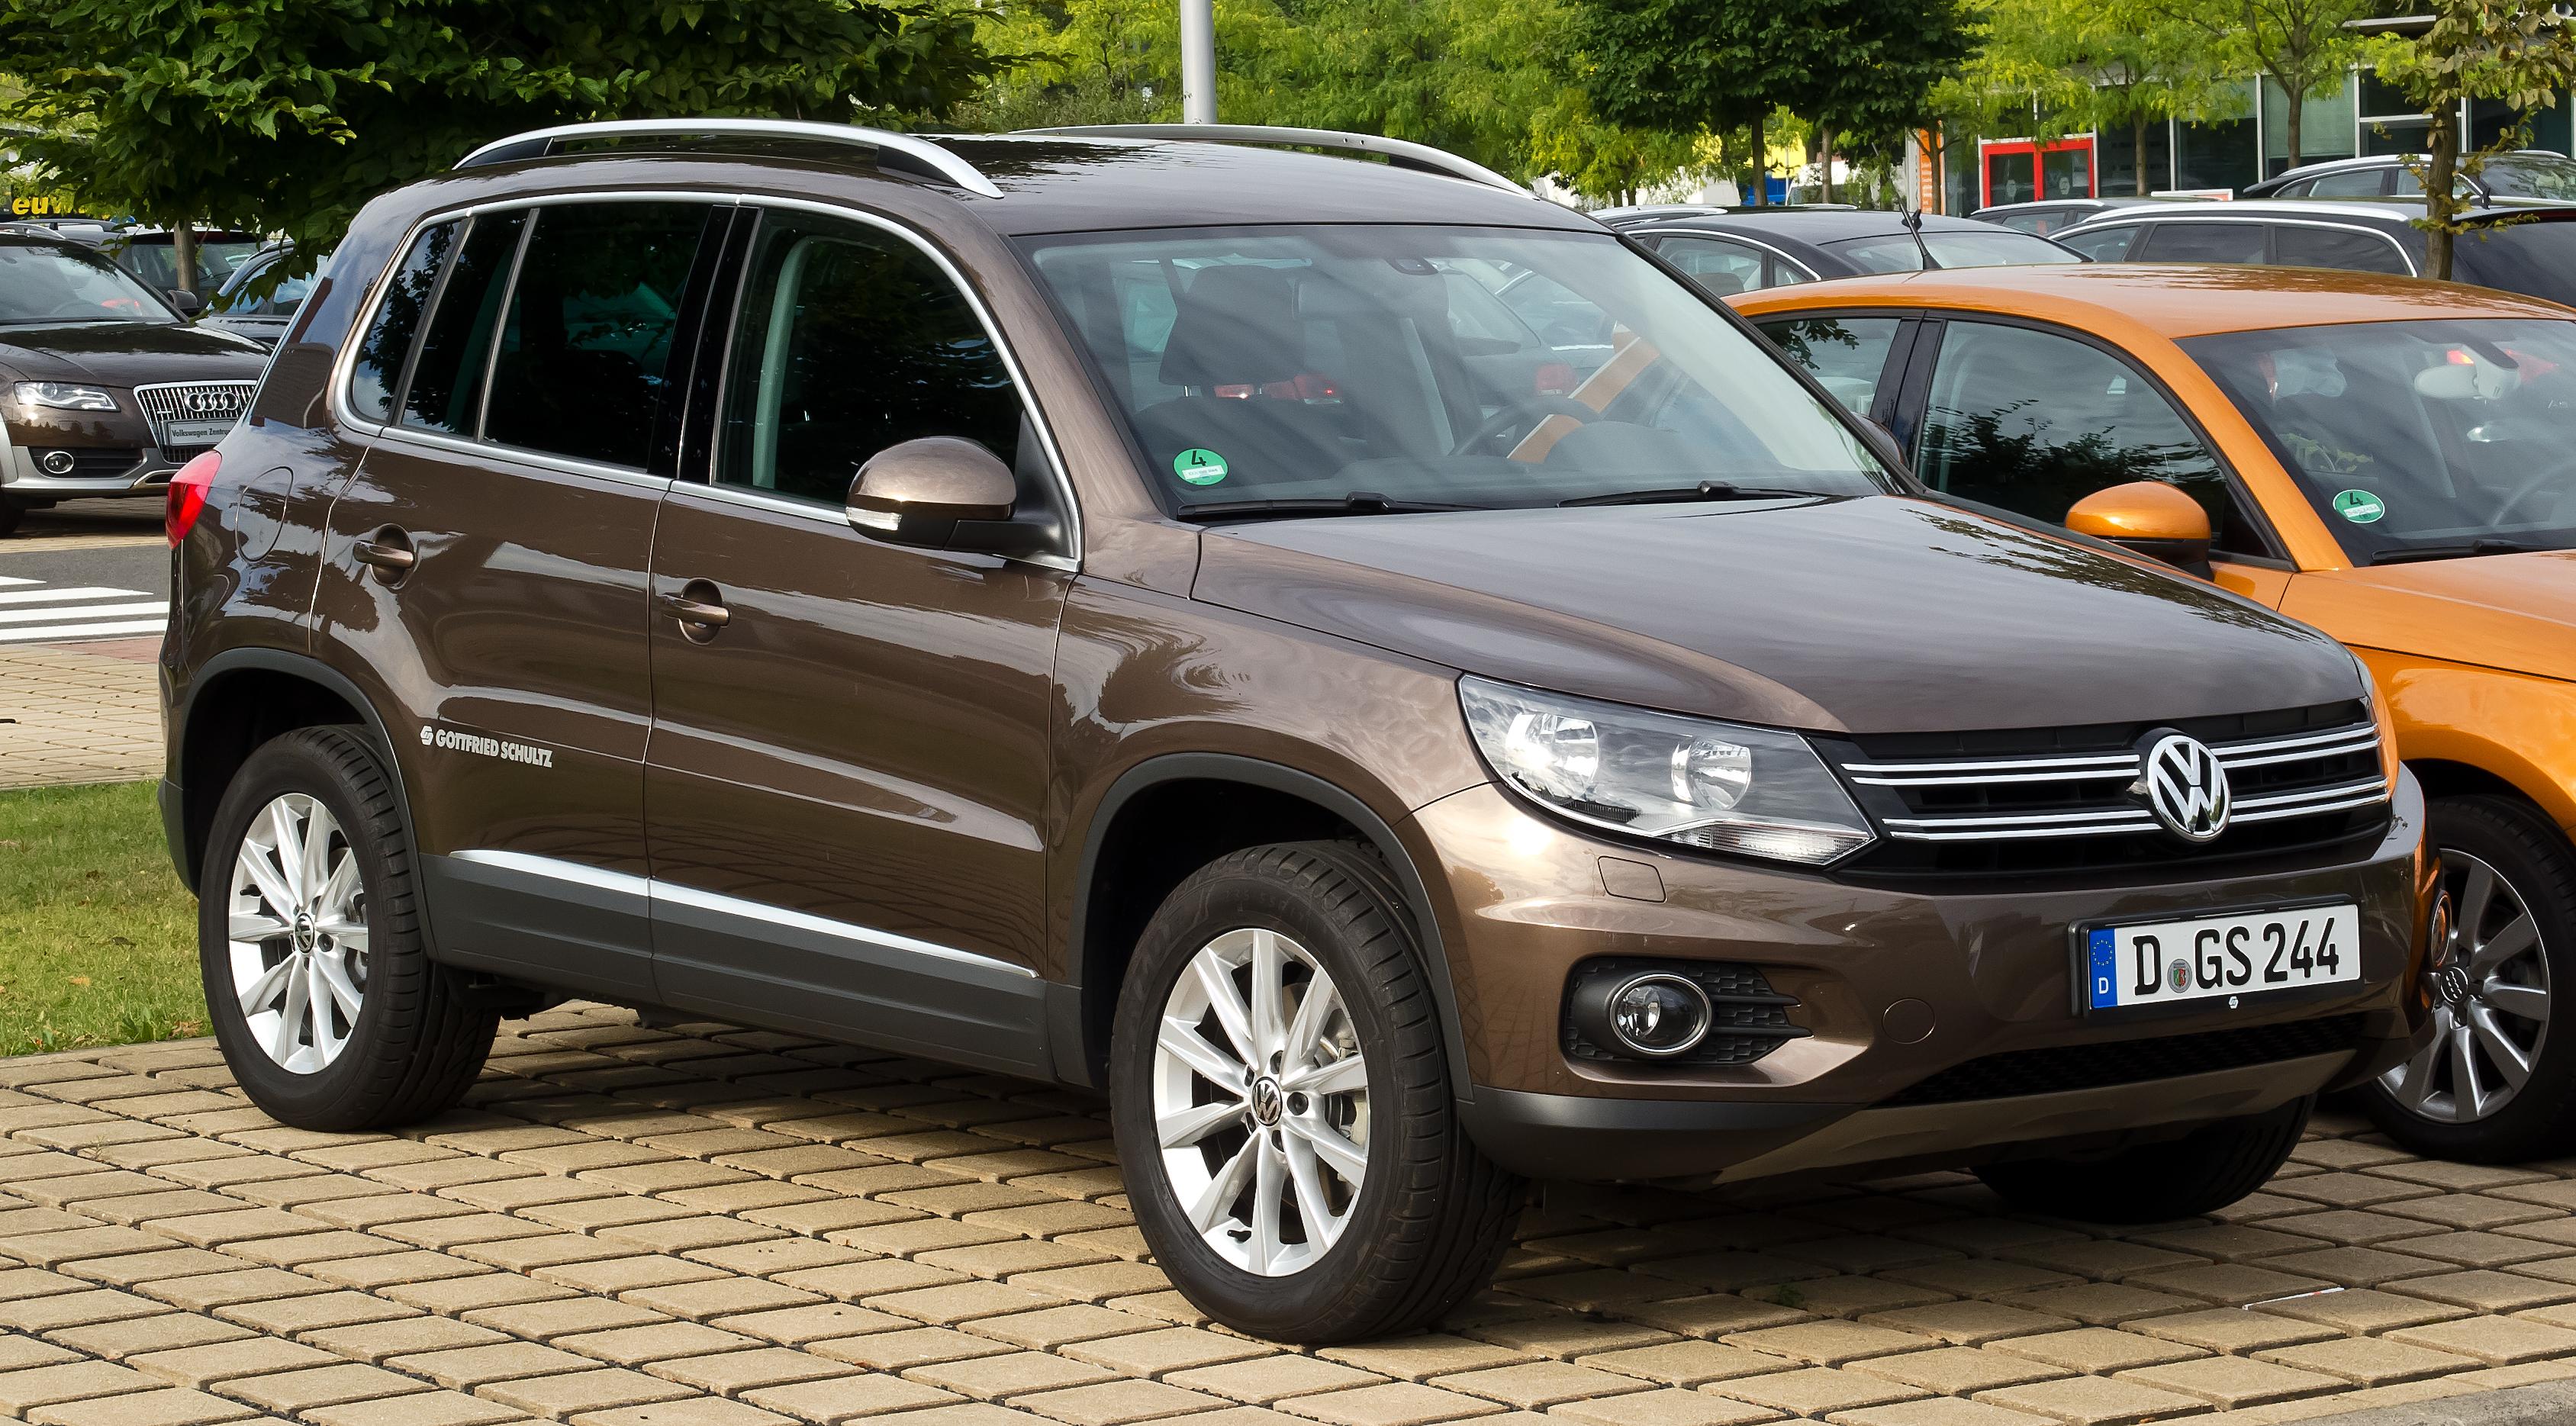 d facelift accessories cobra auto carbon volkswagen product full tiguan vw